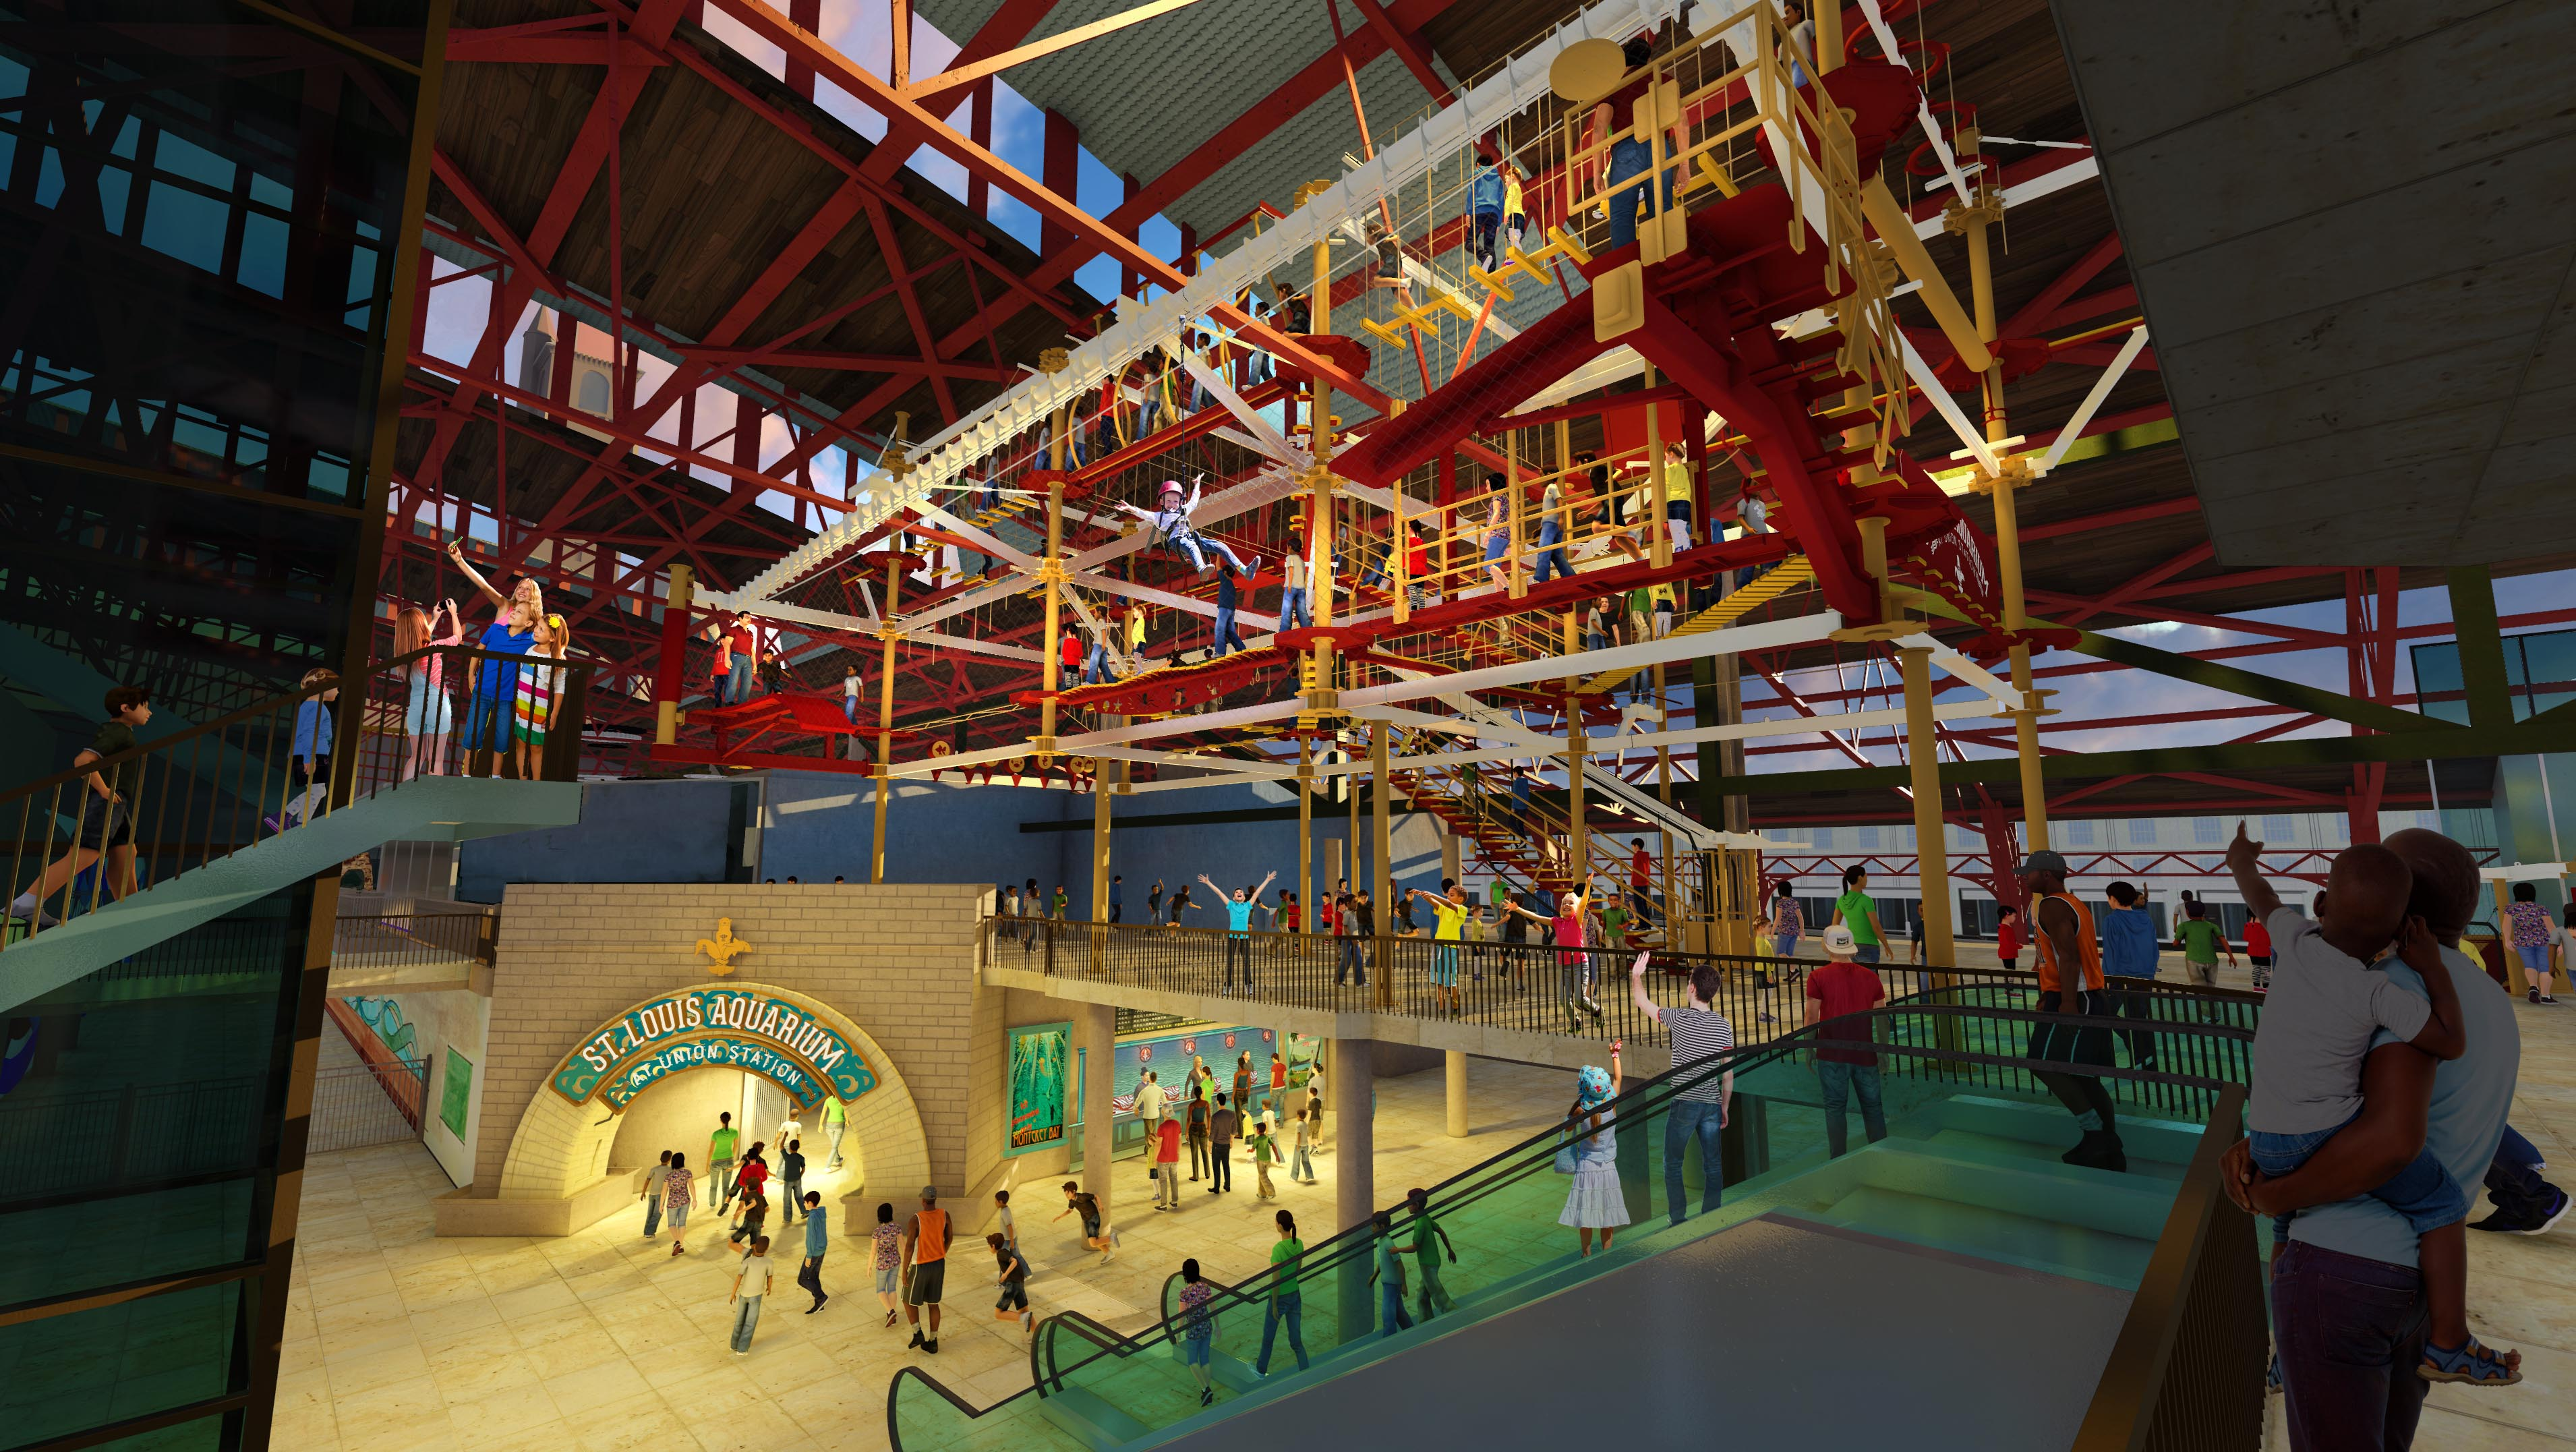 PHOTOS: Long-awaited St. Louis Aquarium will open ...